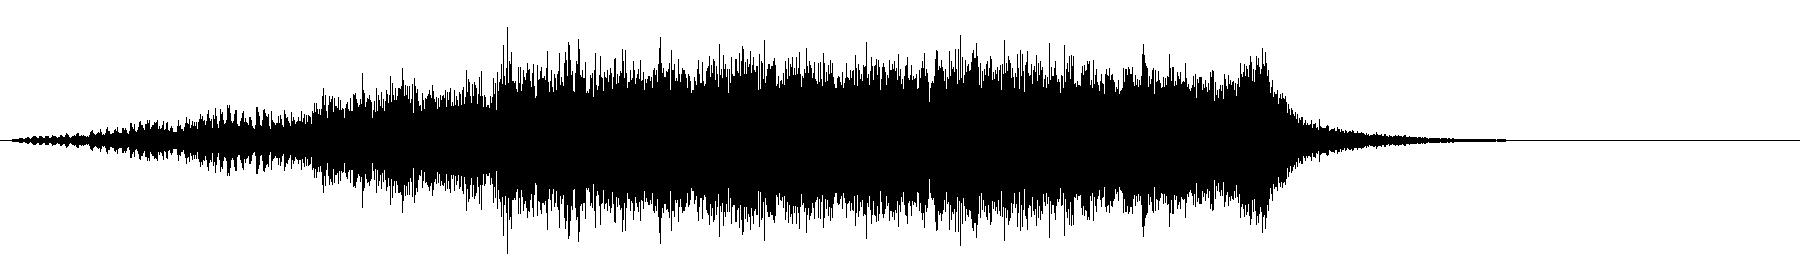 str fx b 09 xc